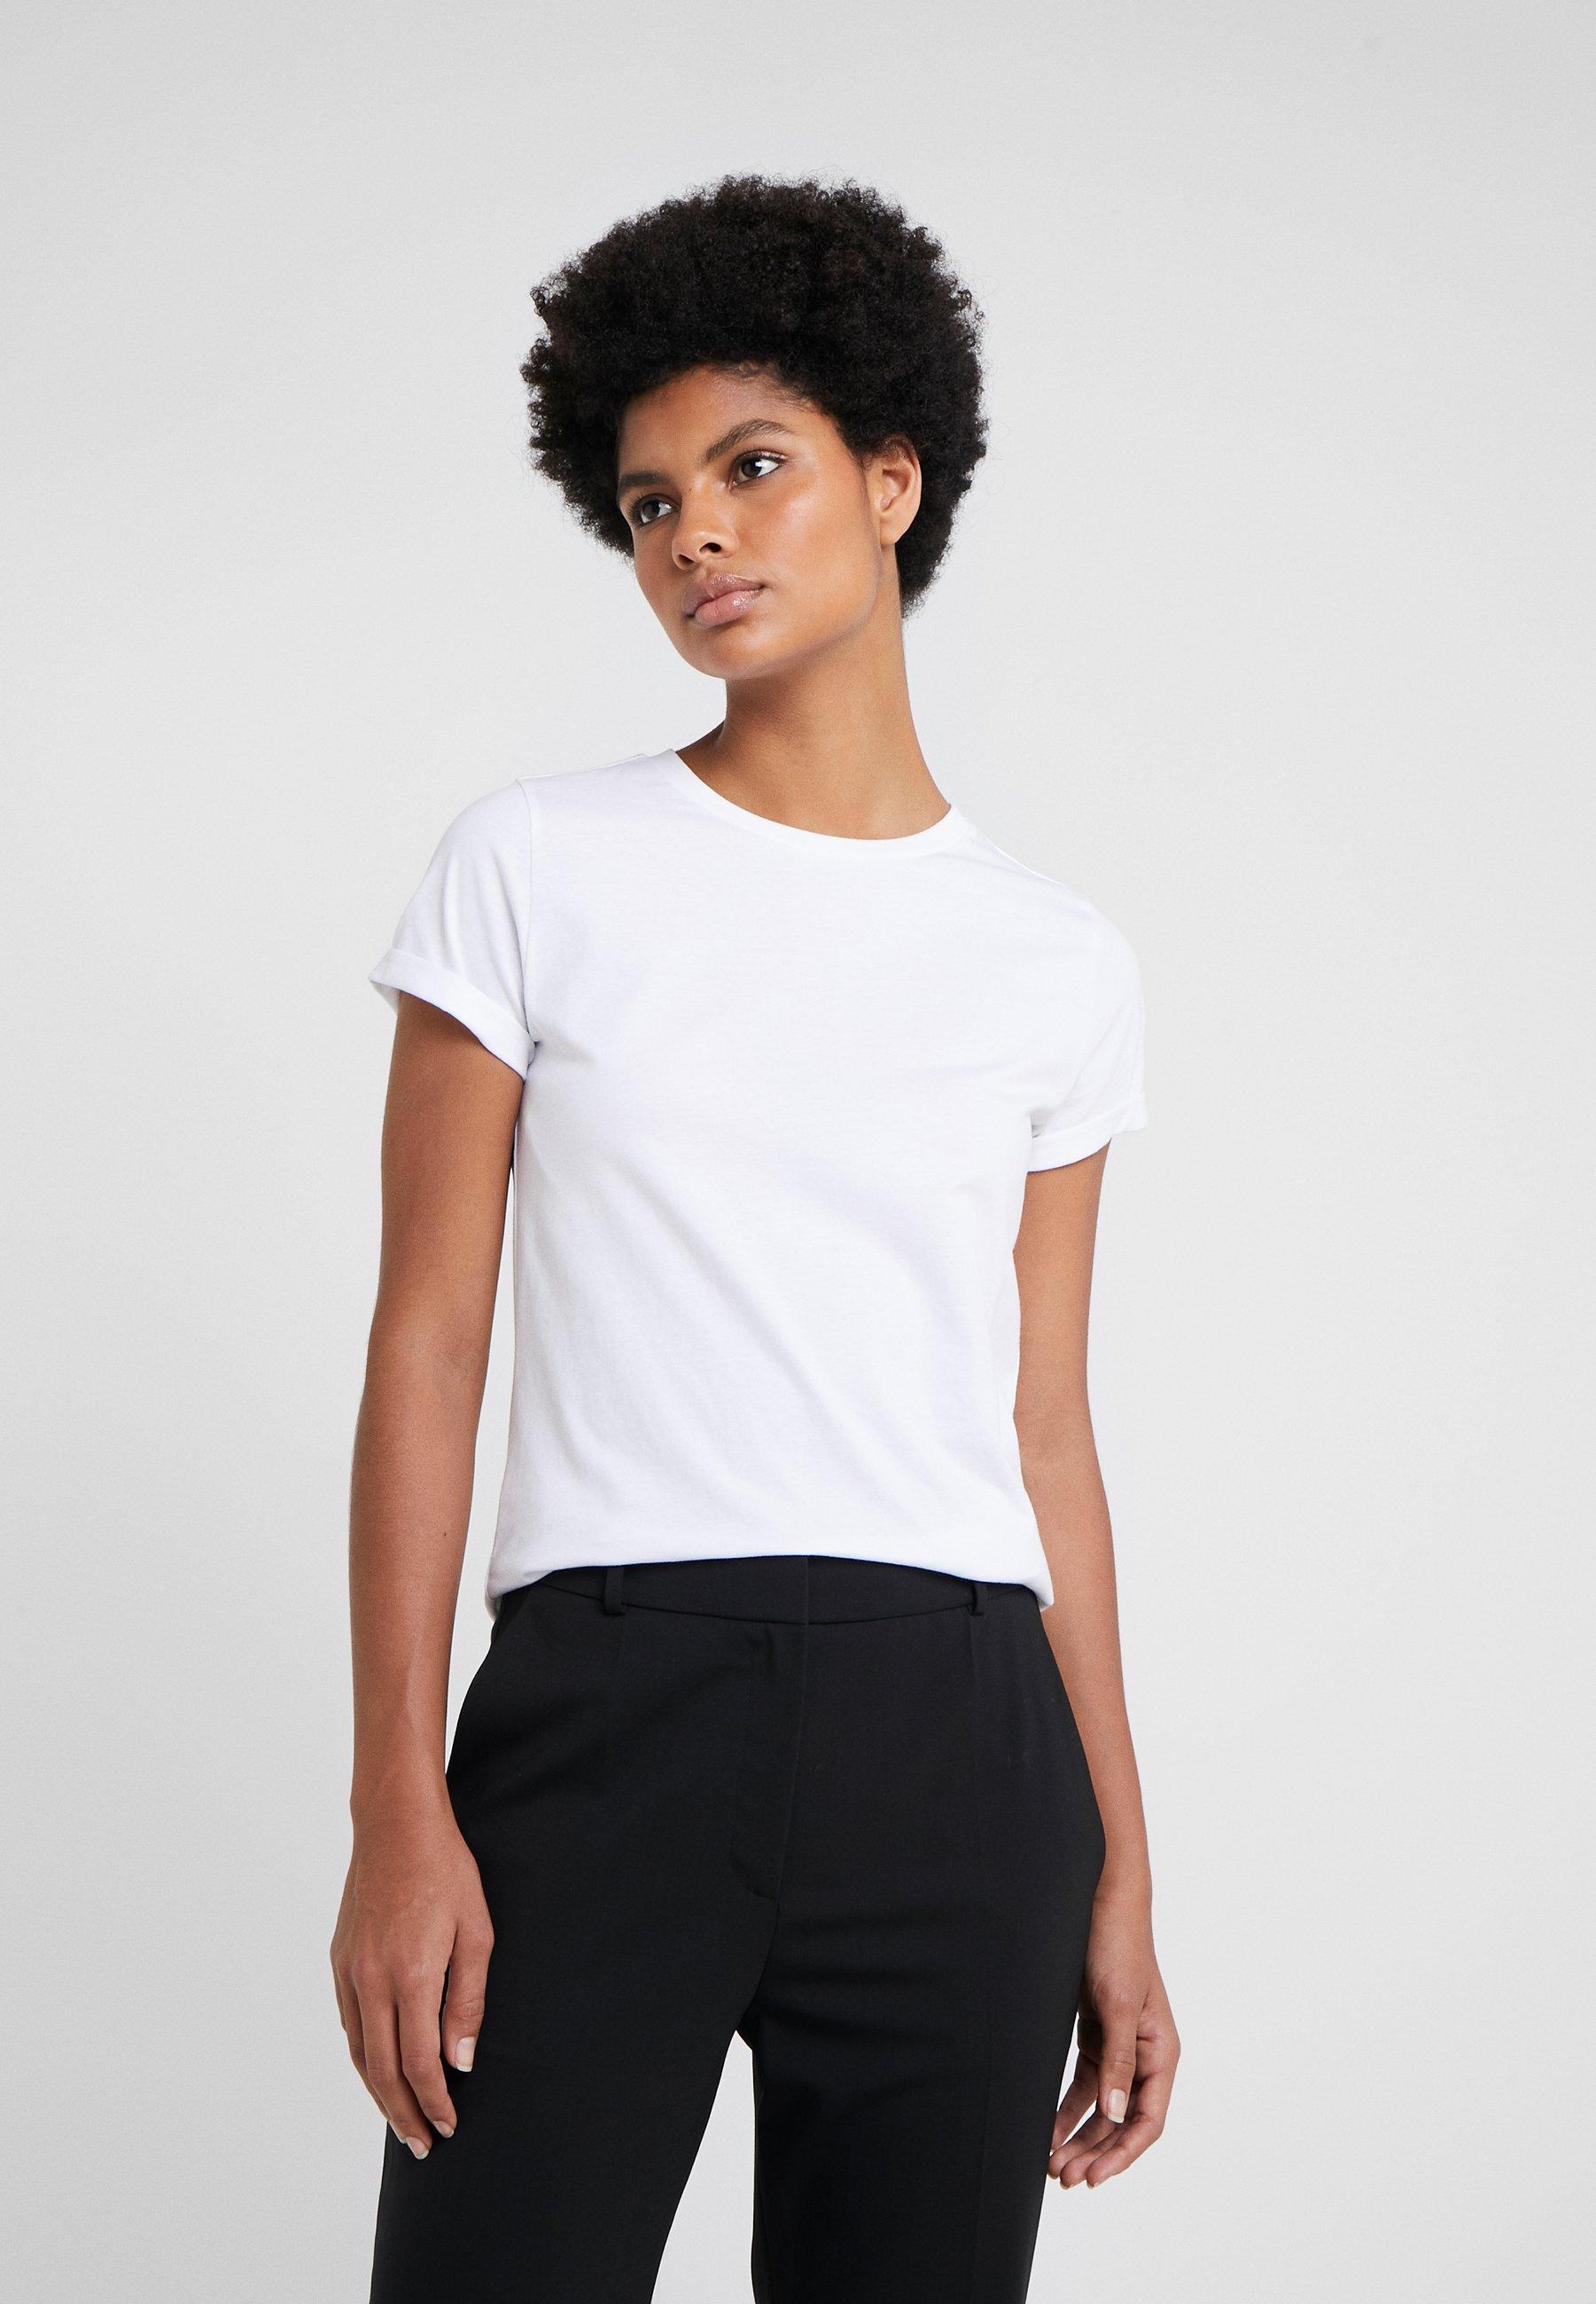 Basique White shirt Hugo Plain The TeeT f6ybgY7v